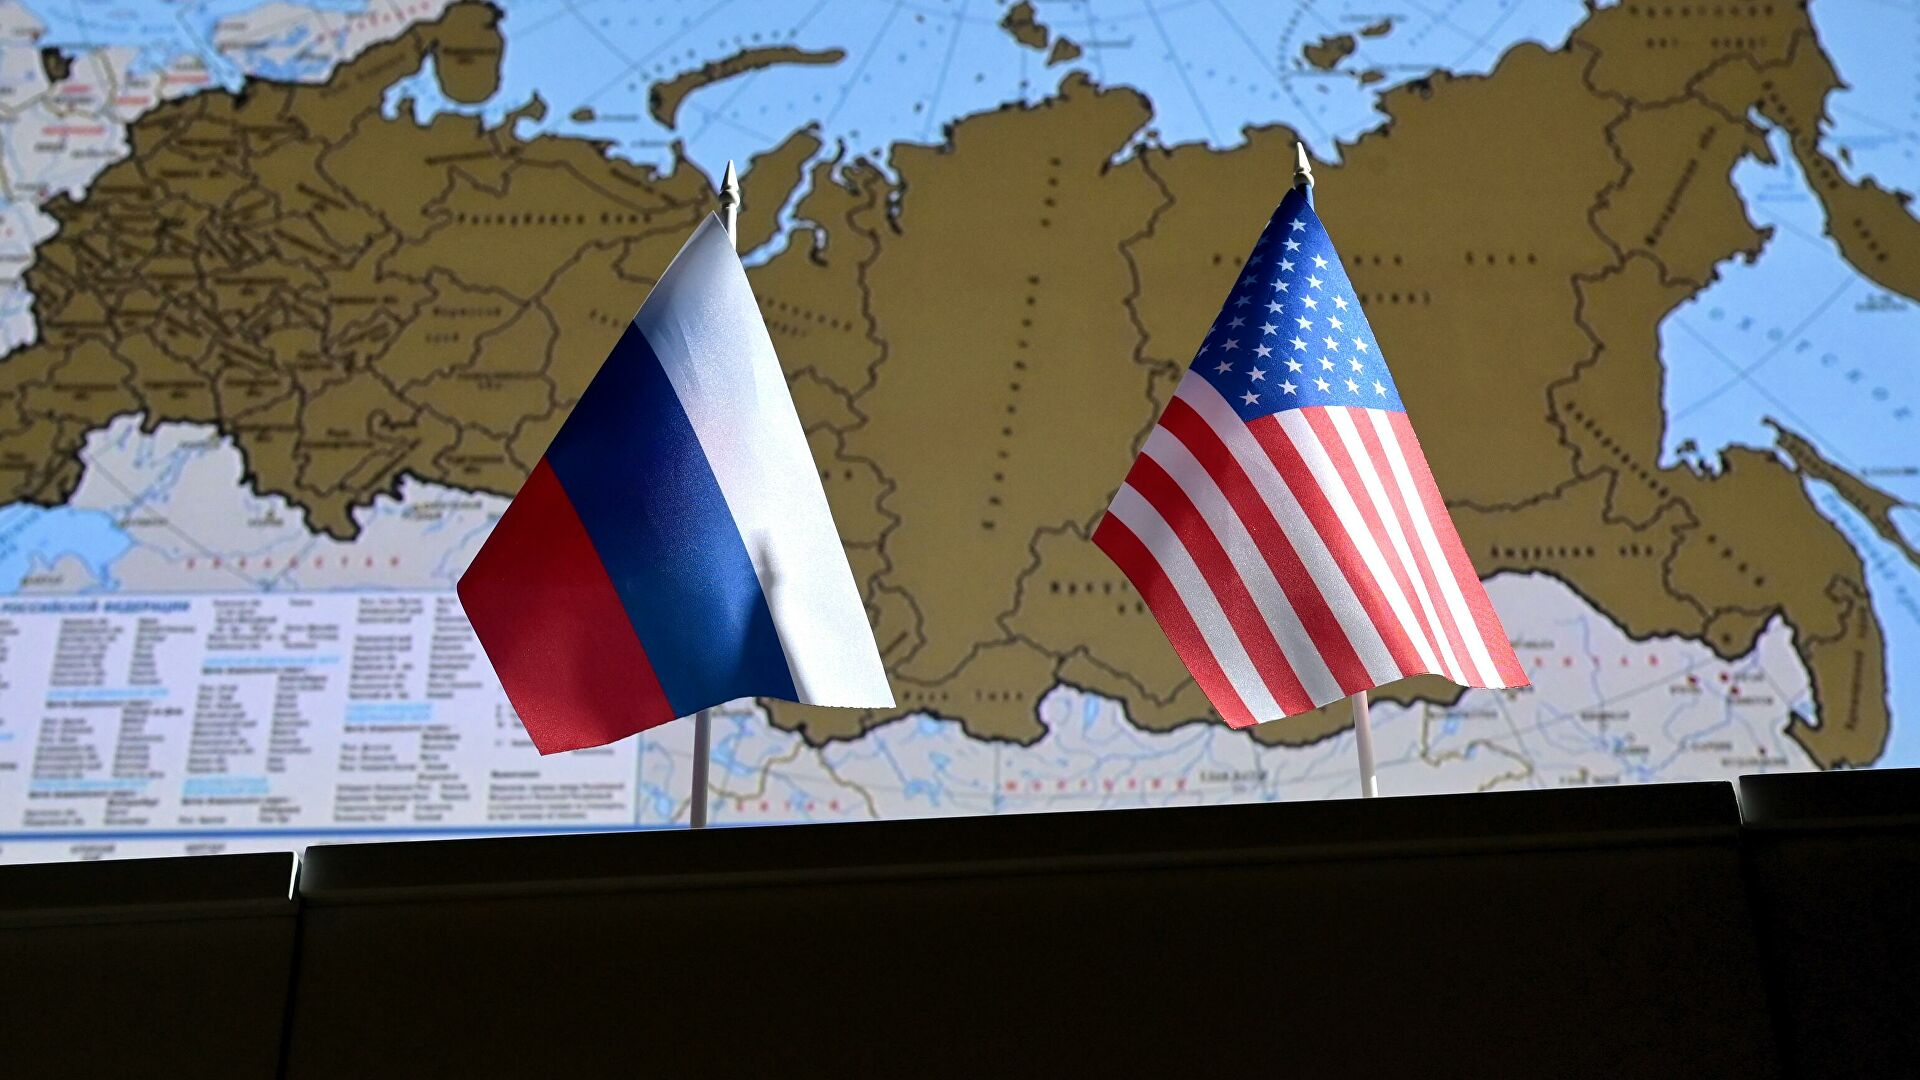 Džabarov: Odgovorićemo recipročno ako SAD proteraju naše diplomate